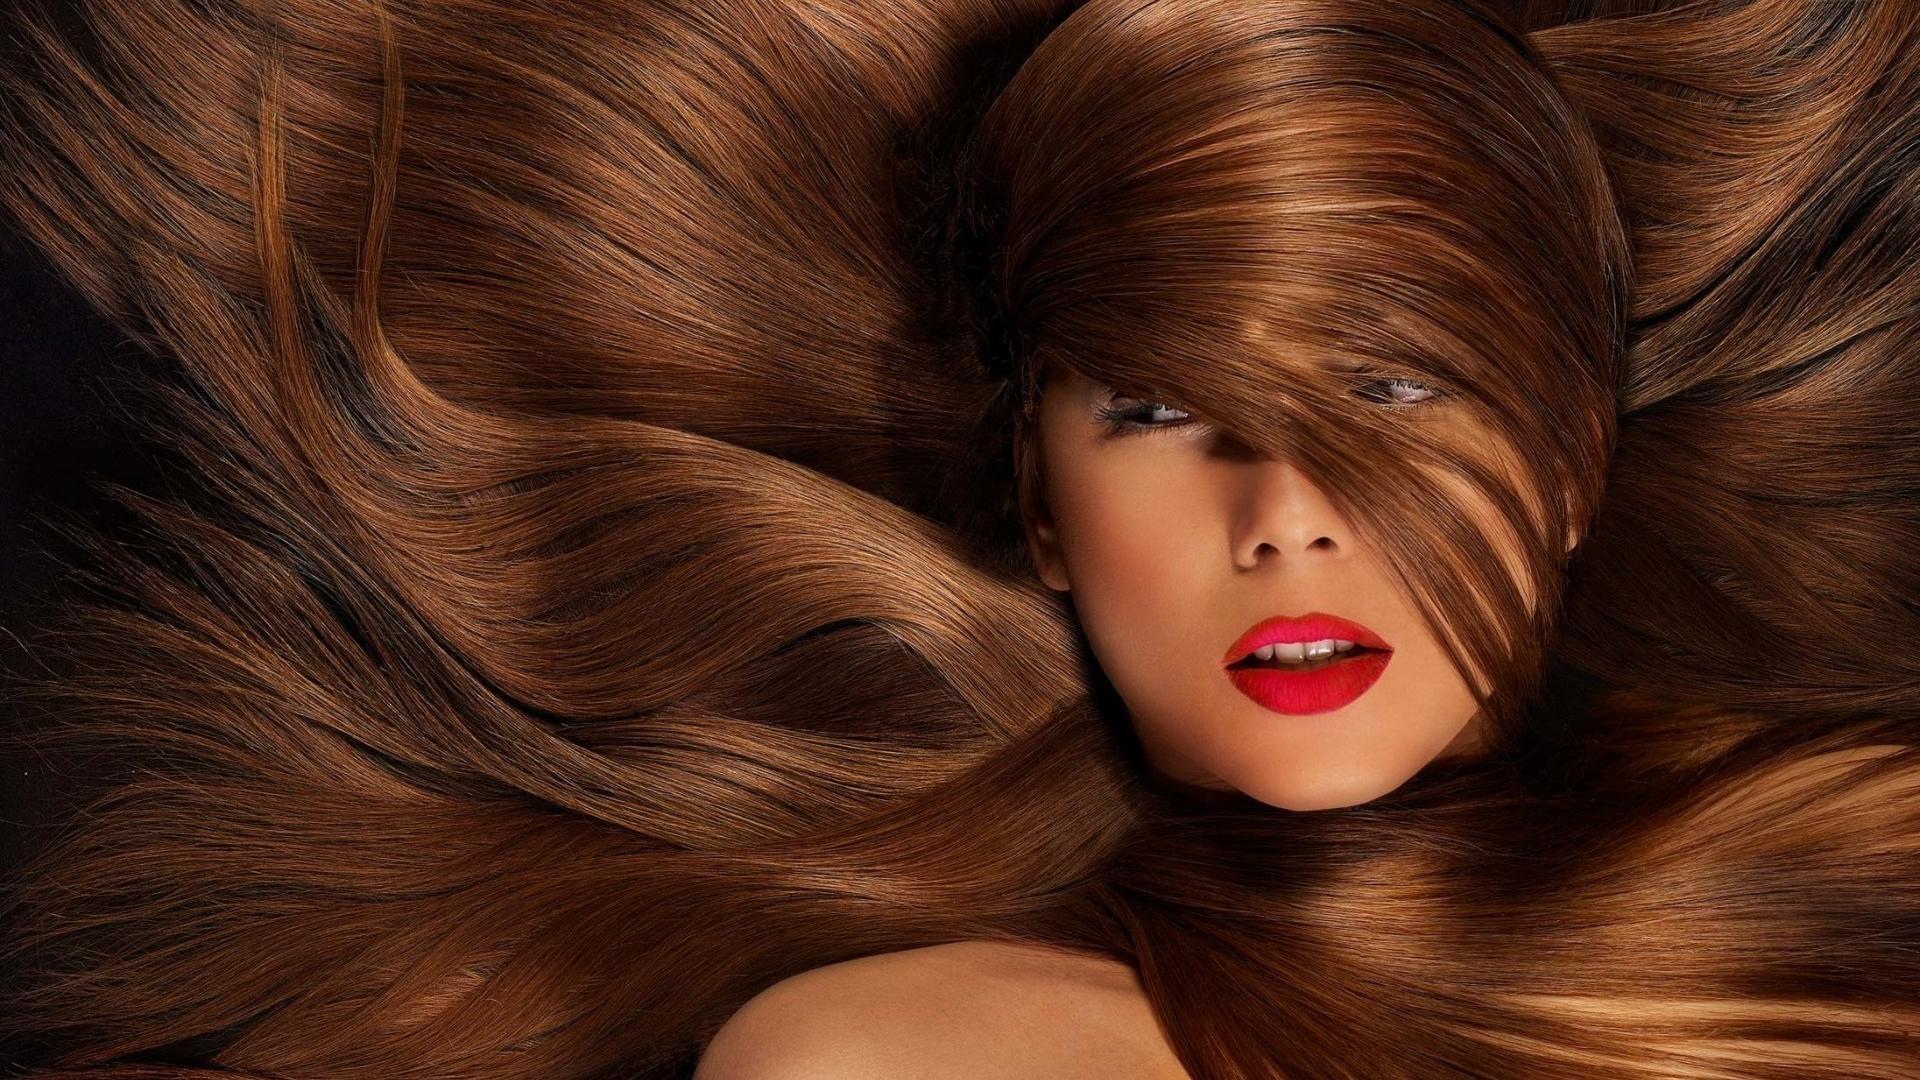 9cb84d7b5 Long Hair Babe Wallpaper by HD Wallpapers Daily 1920x1080